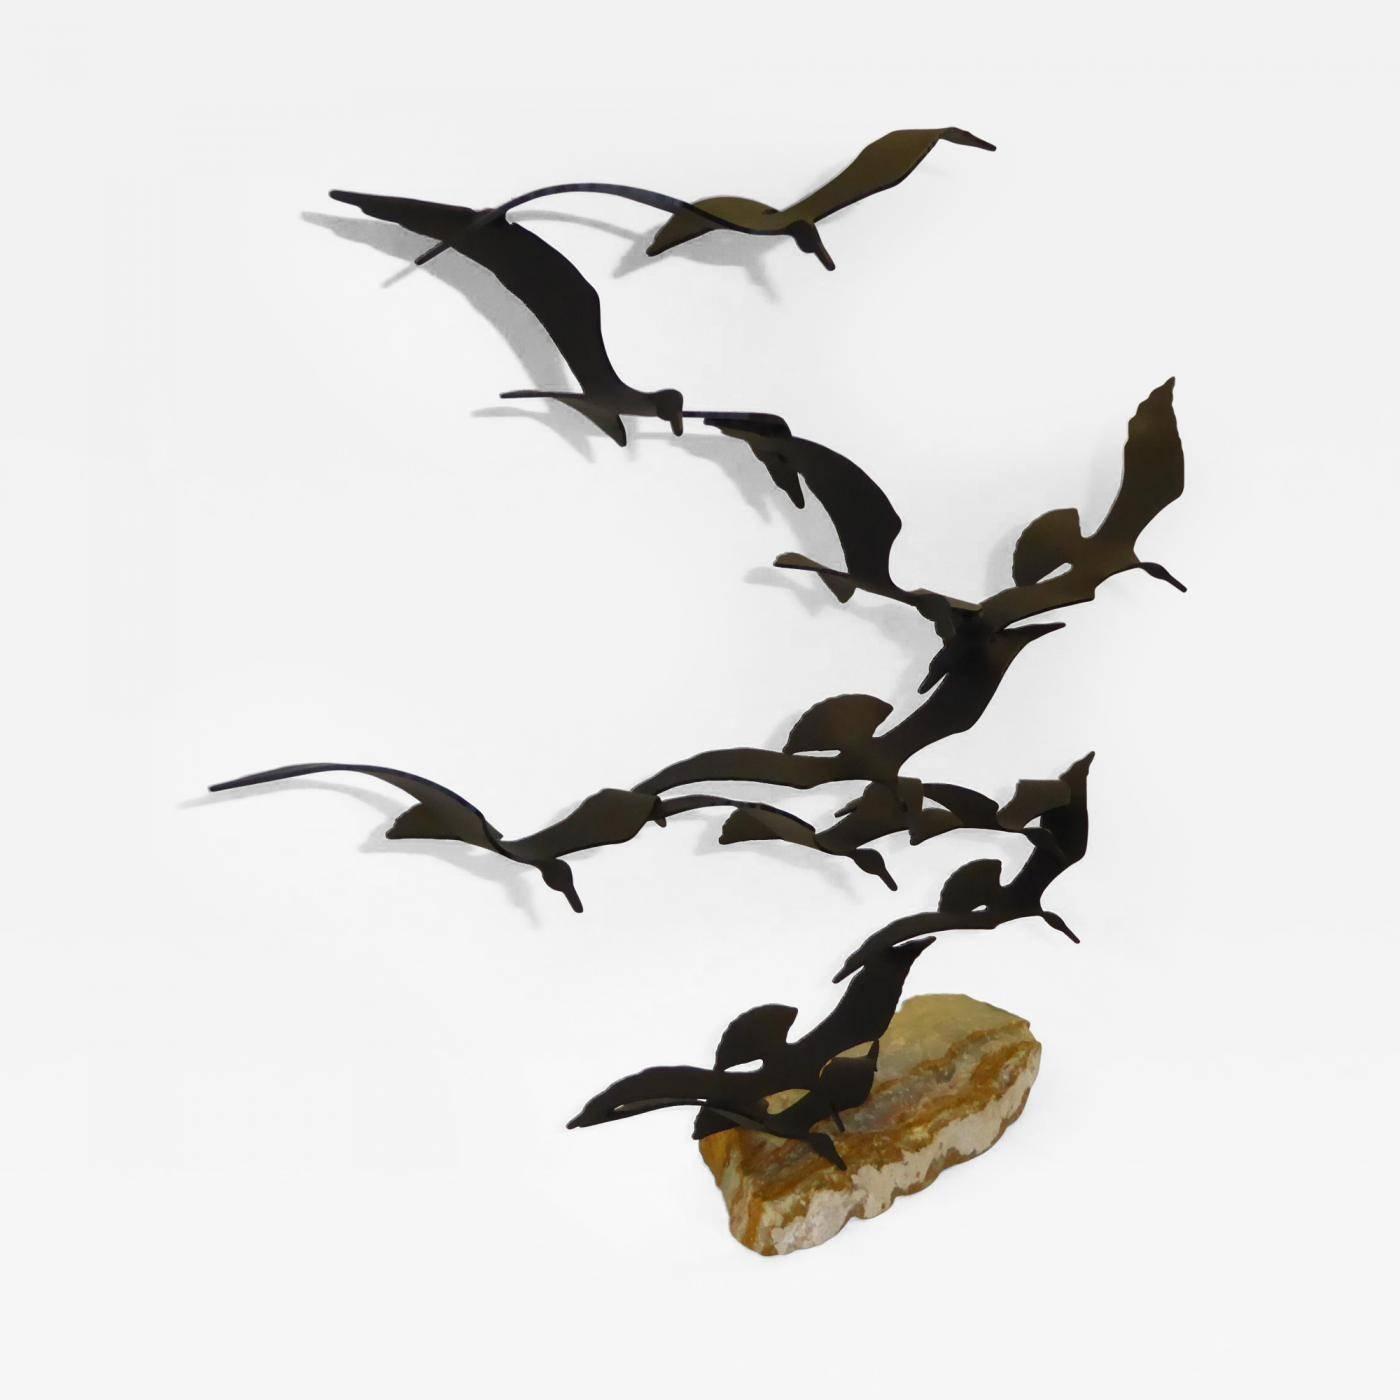 Bijan – Flock Of Seagulls Metal Sculpturebijan, 1970's California In Recent Metal Wall Art Flock Of Seagulls (View 22 of 30)